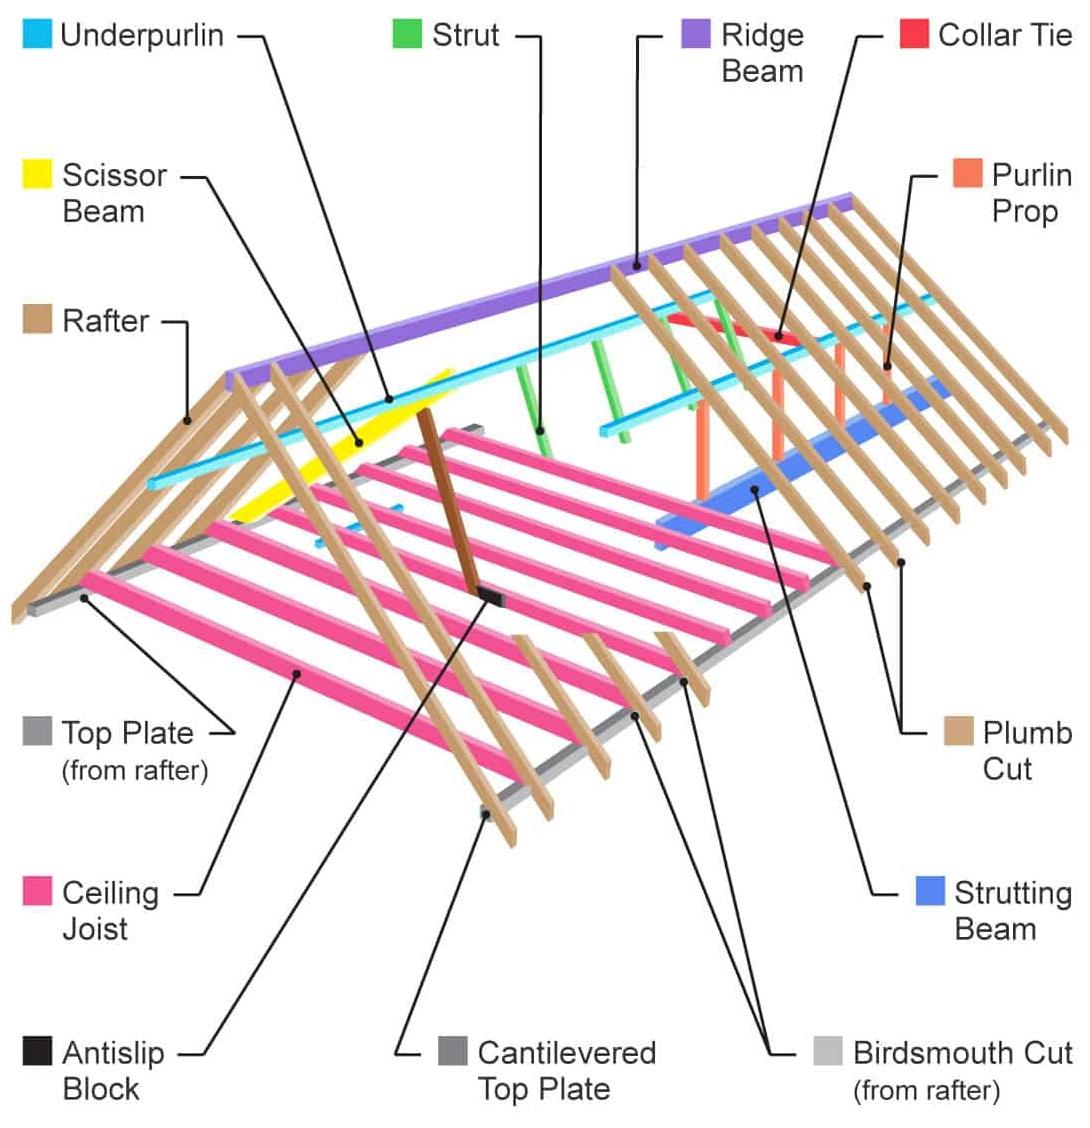 Roofing - SHEEHAN INC